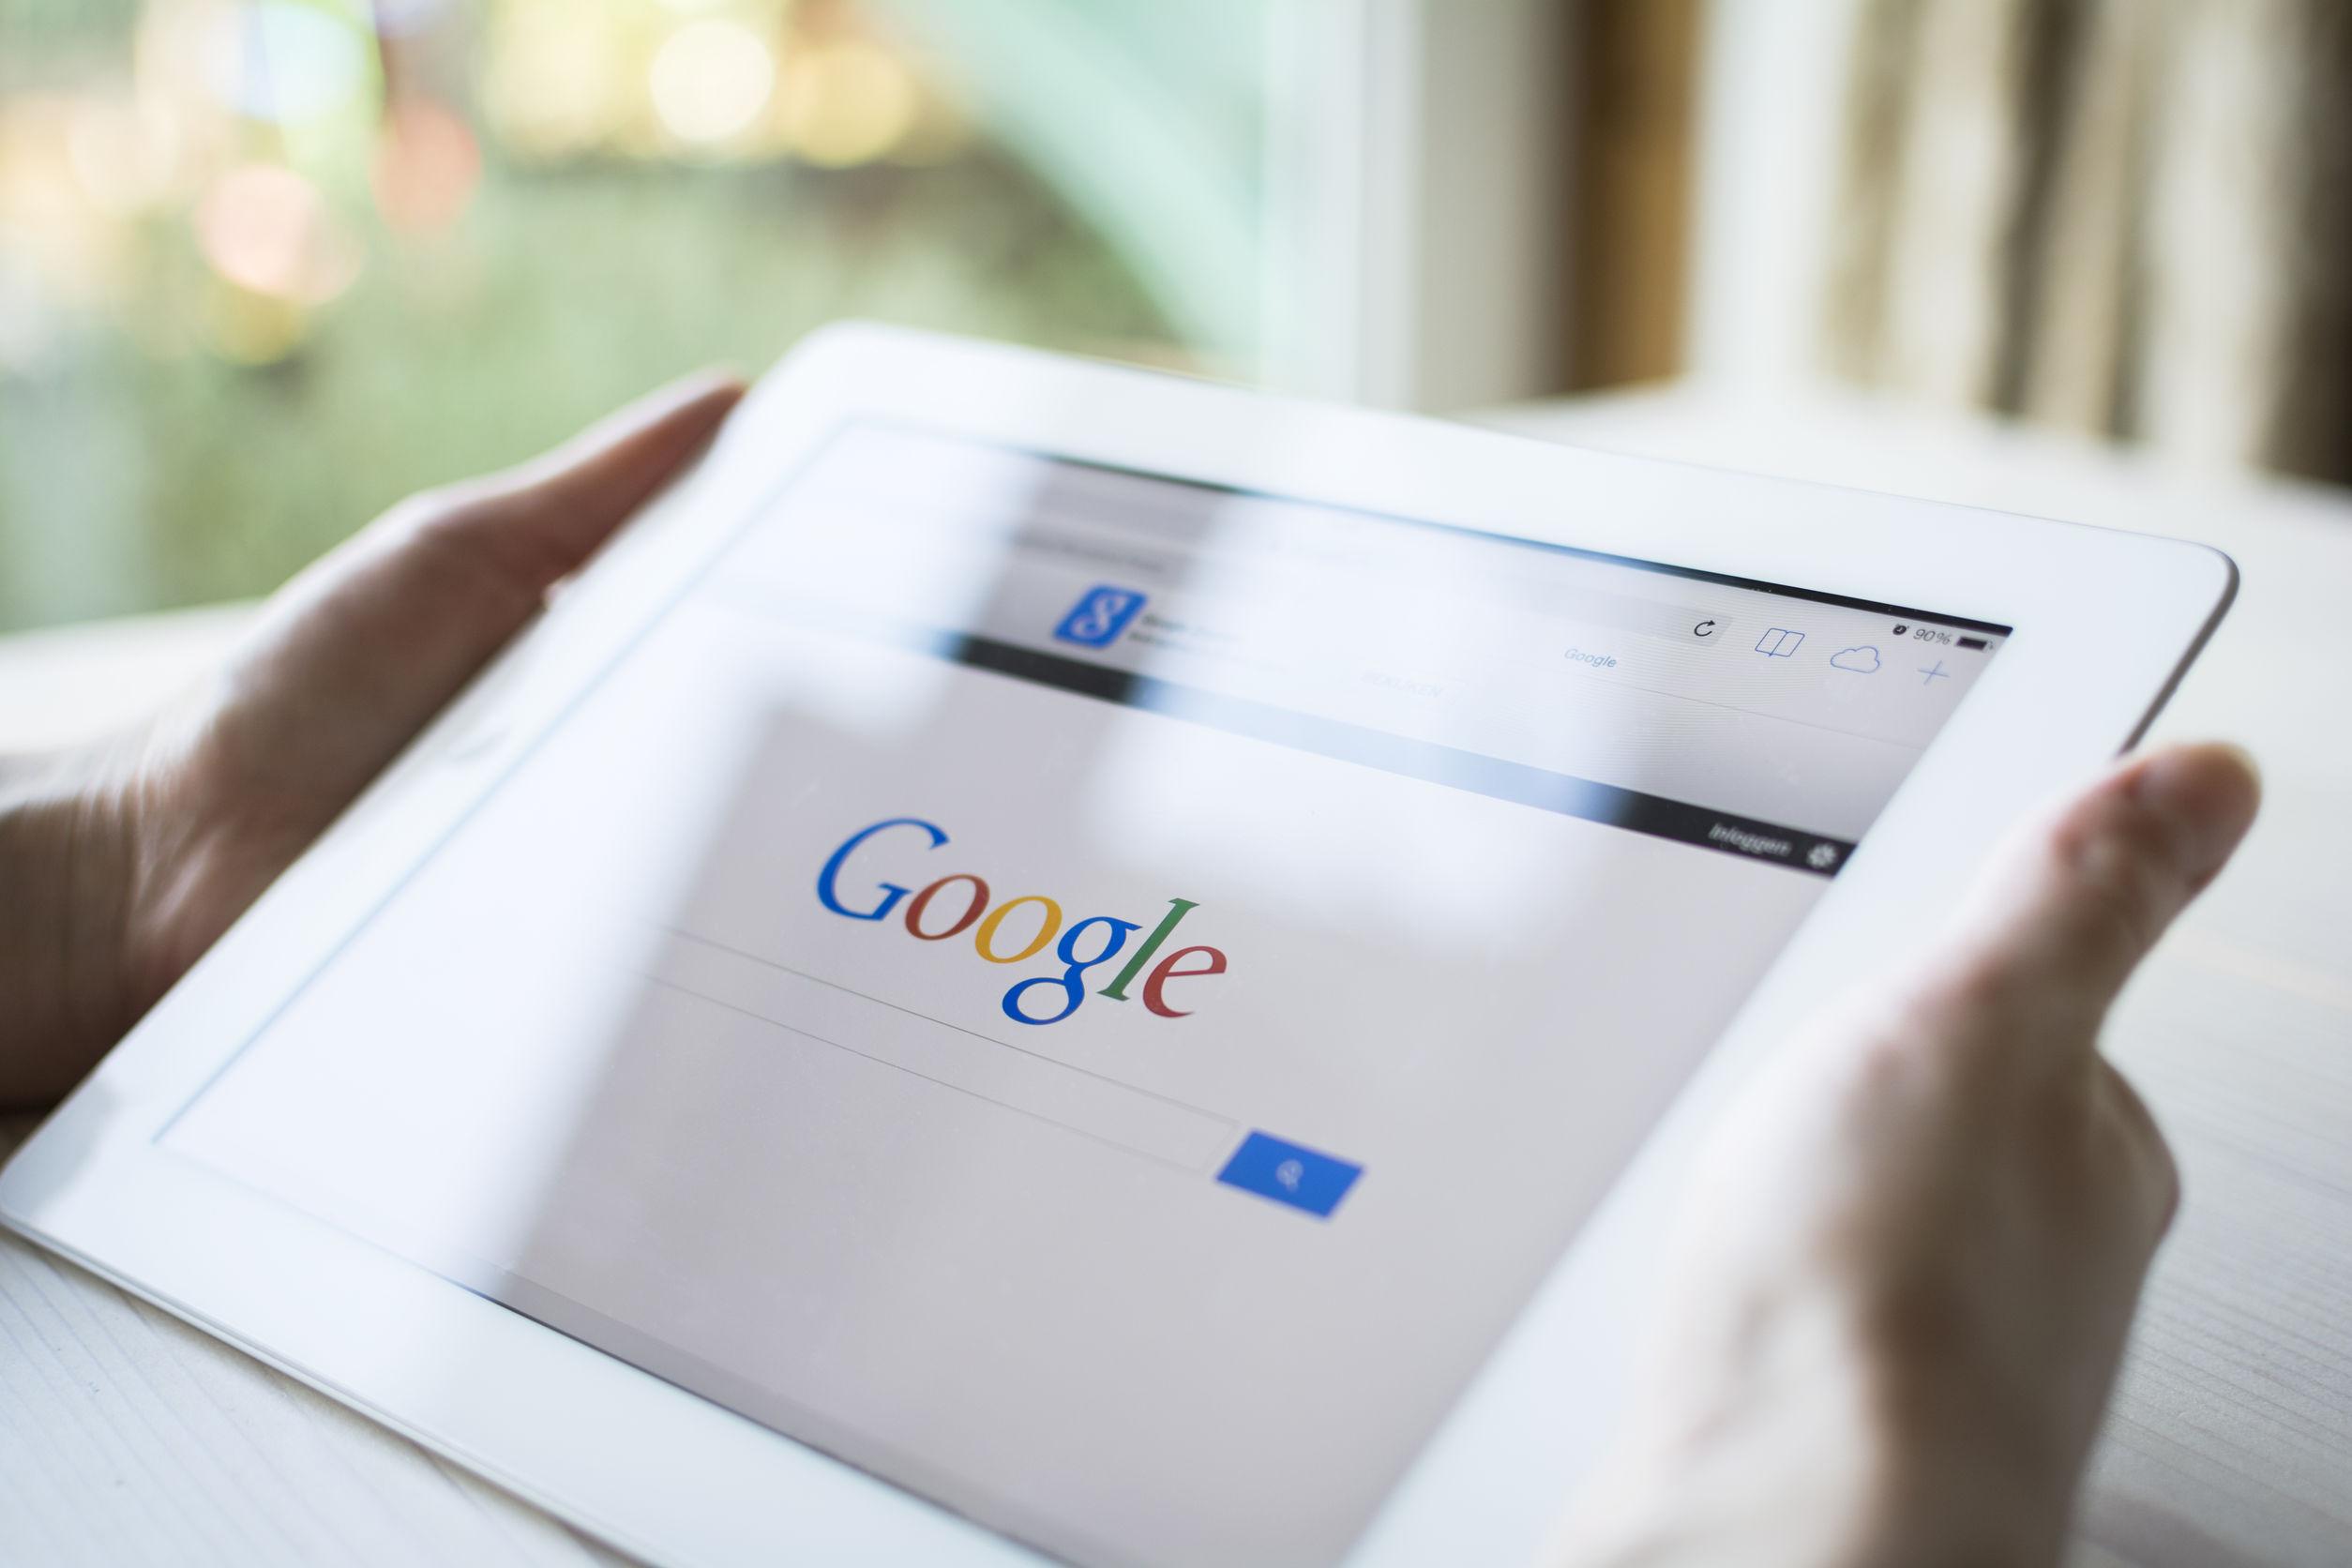 Google Search Reputation Management Services